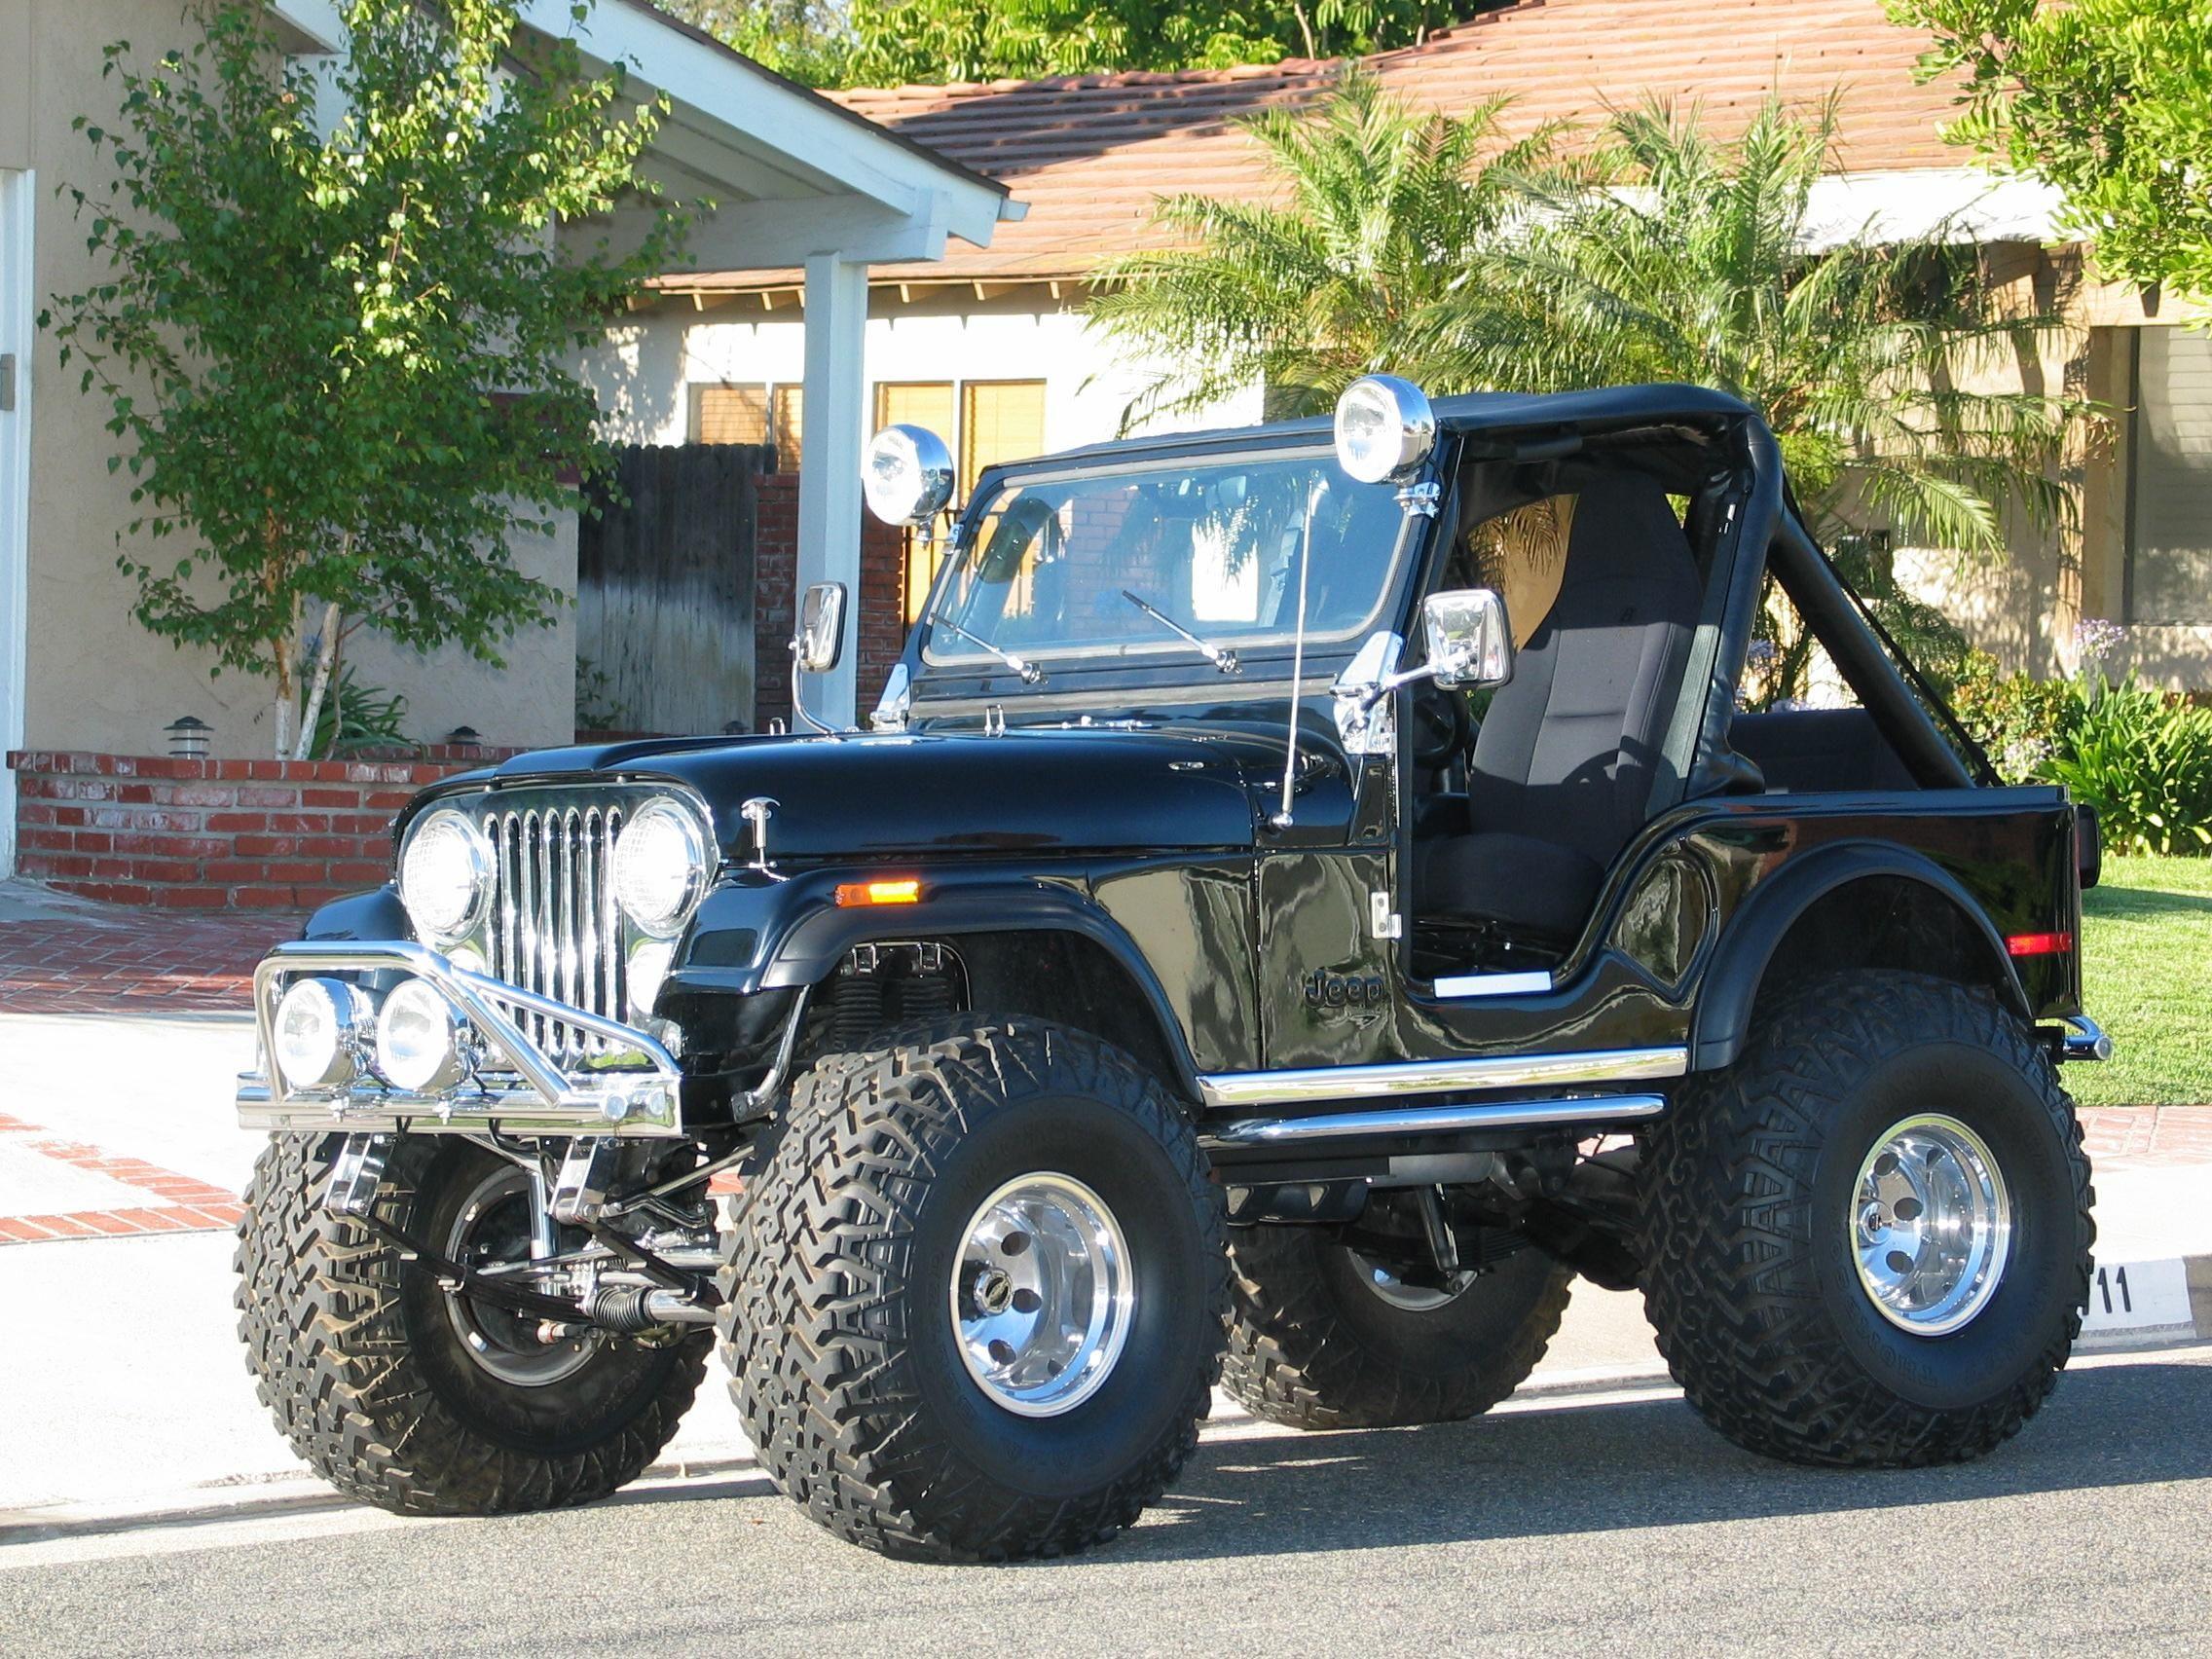 park tuxedo cj ontario for tuxedopark jeep ebay ewillys canada sale